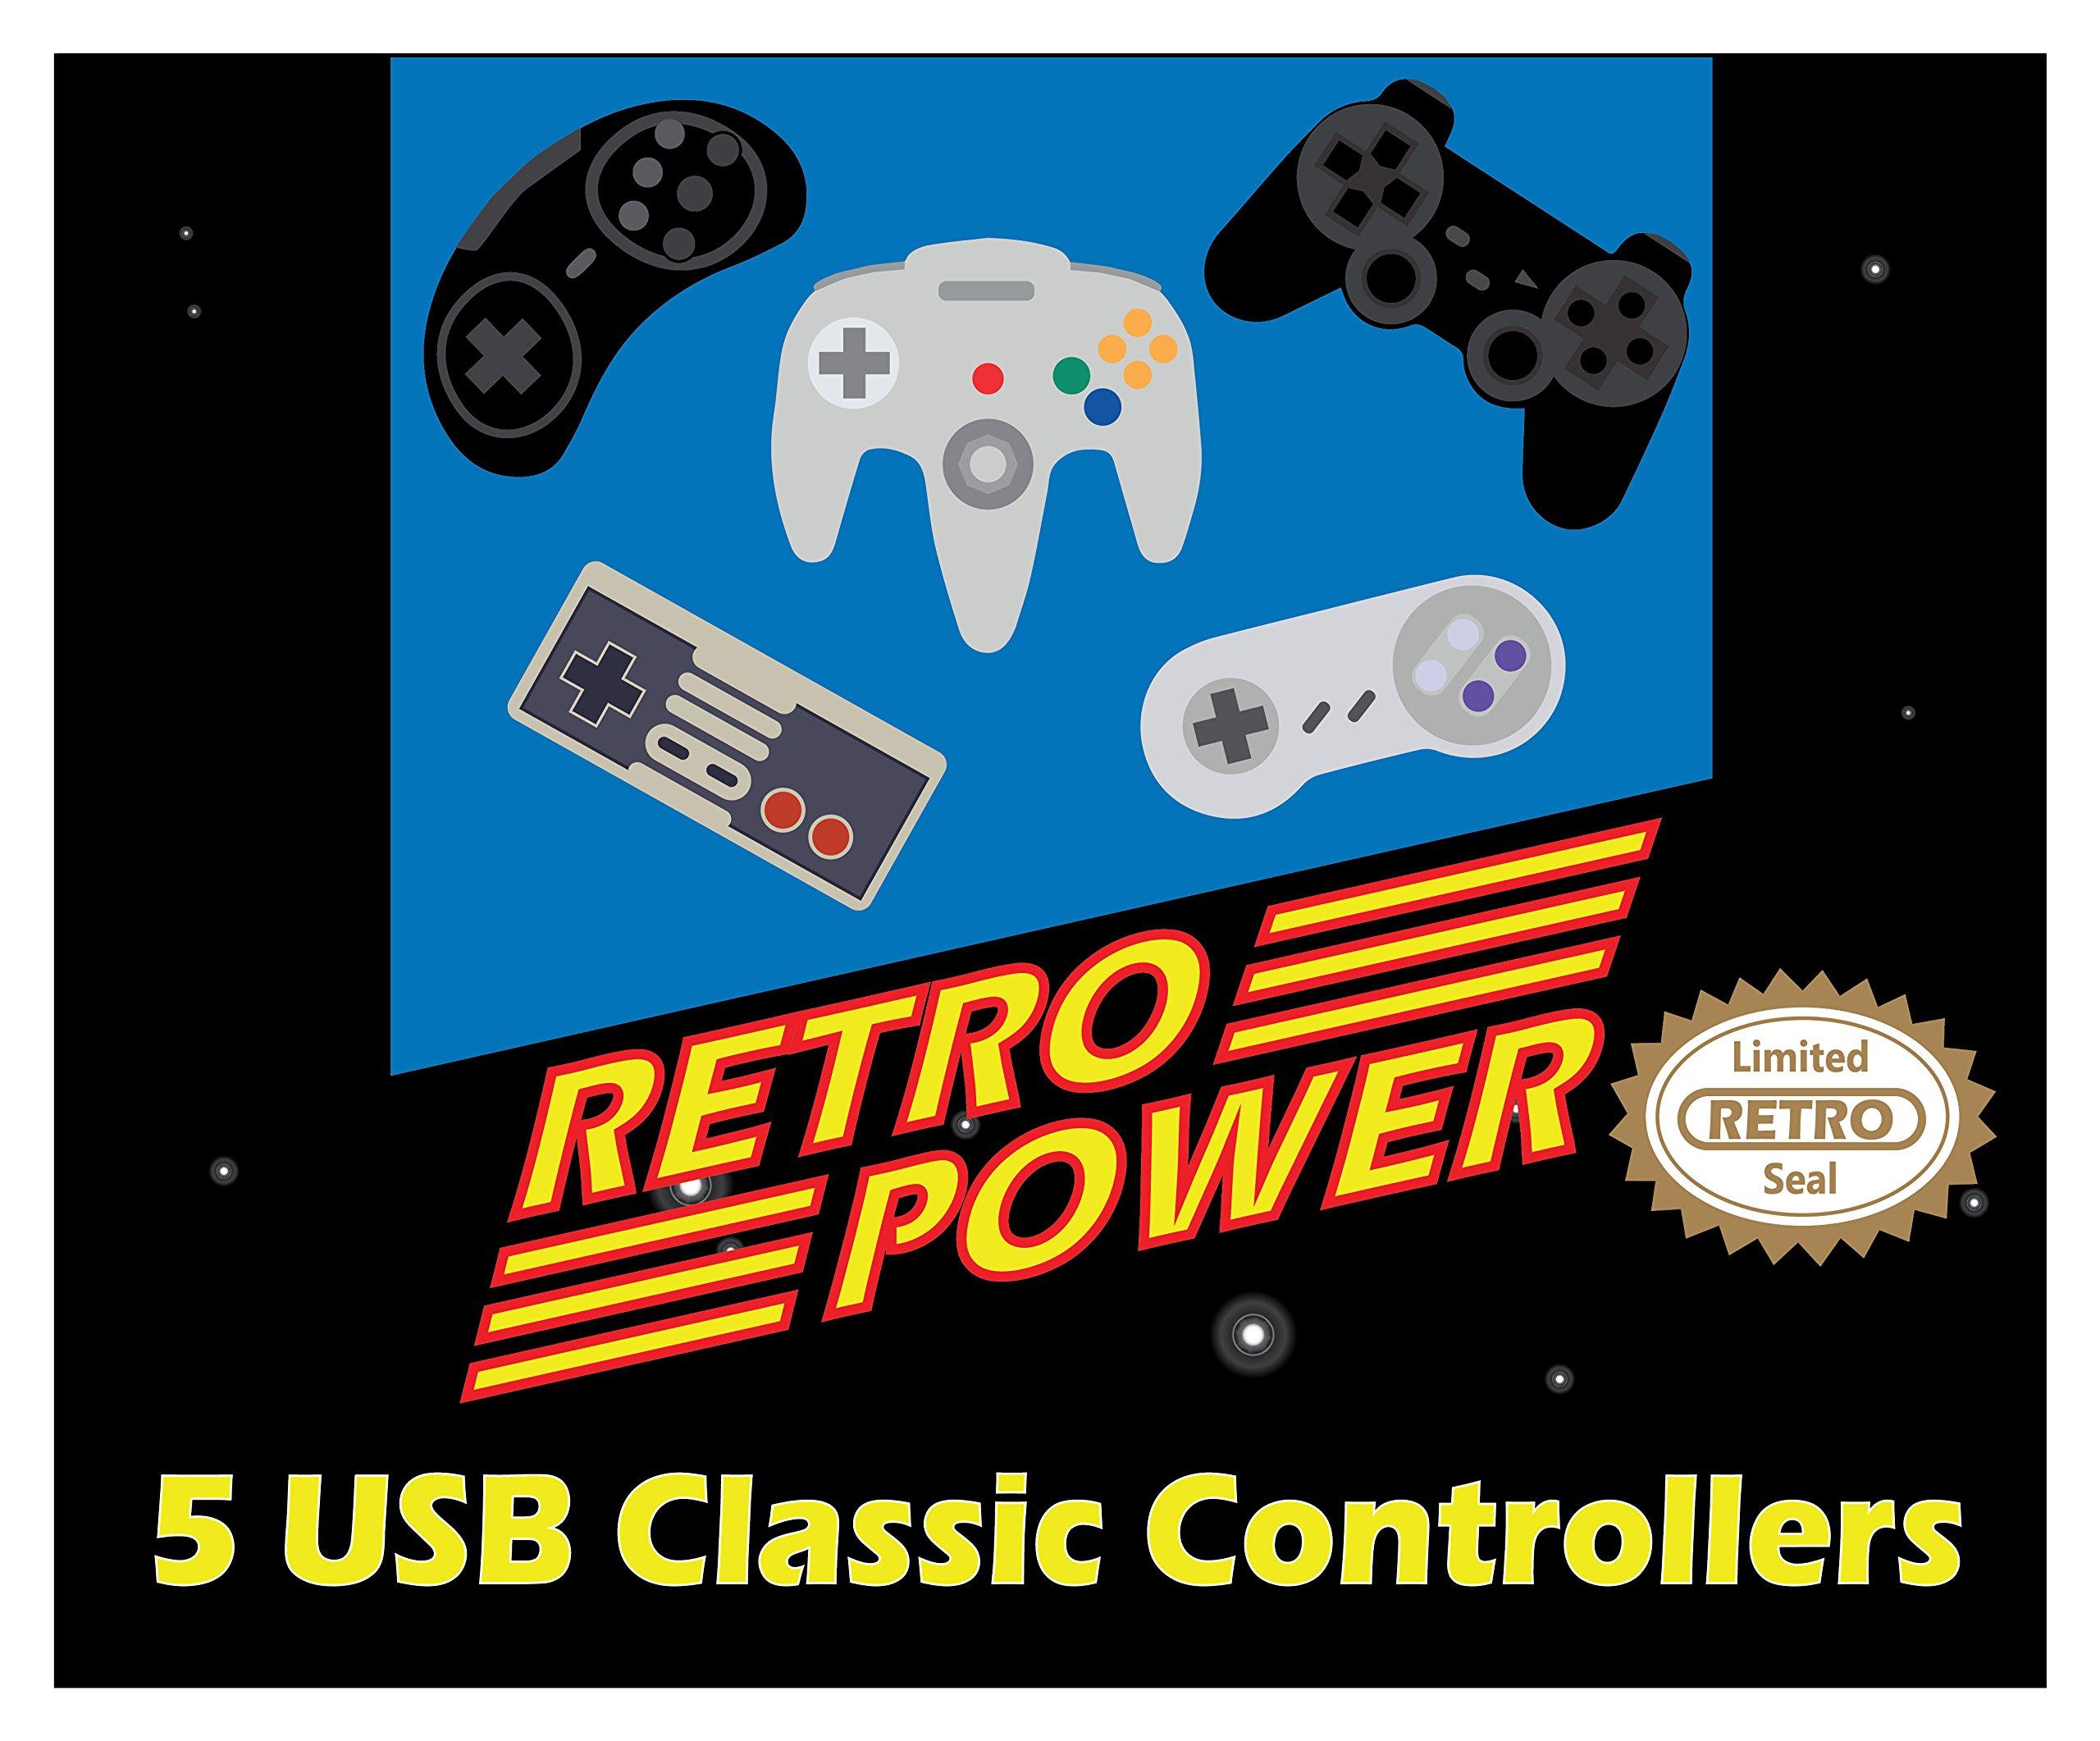 New 2019: 5 USB Classic Controllers - NES, SNES, Sega Genesis, N64,  Playstation 2 (PS2) for RetroPie, PC, HyperSpin, MAME, Emulator, Raspberry  Pi